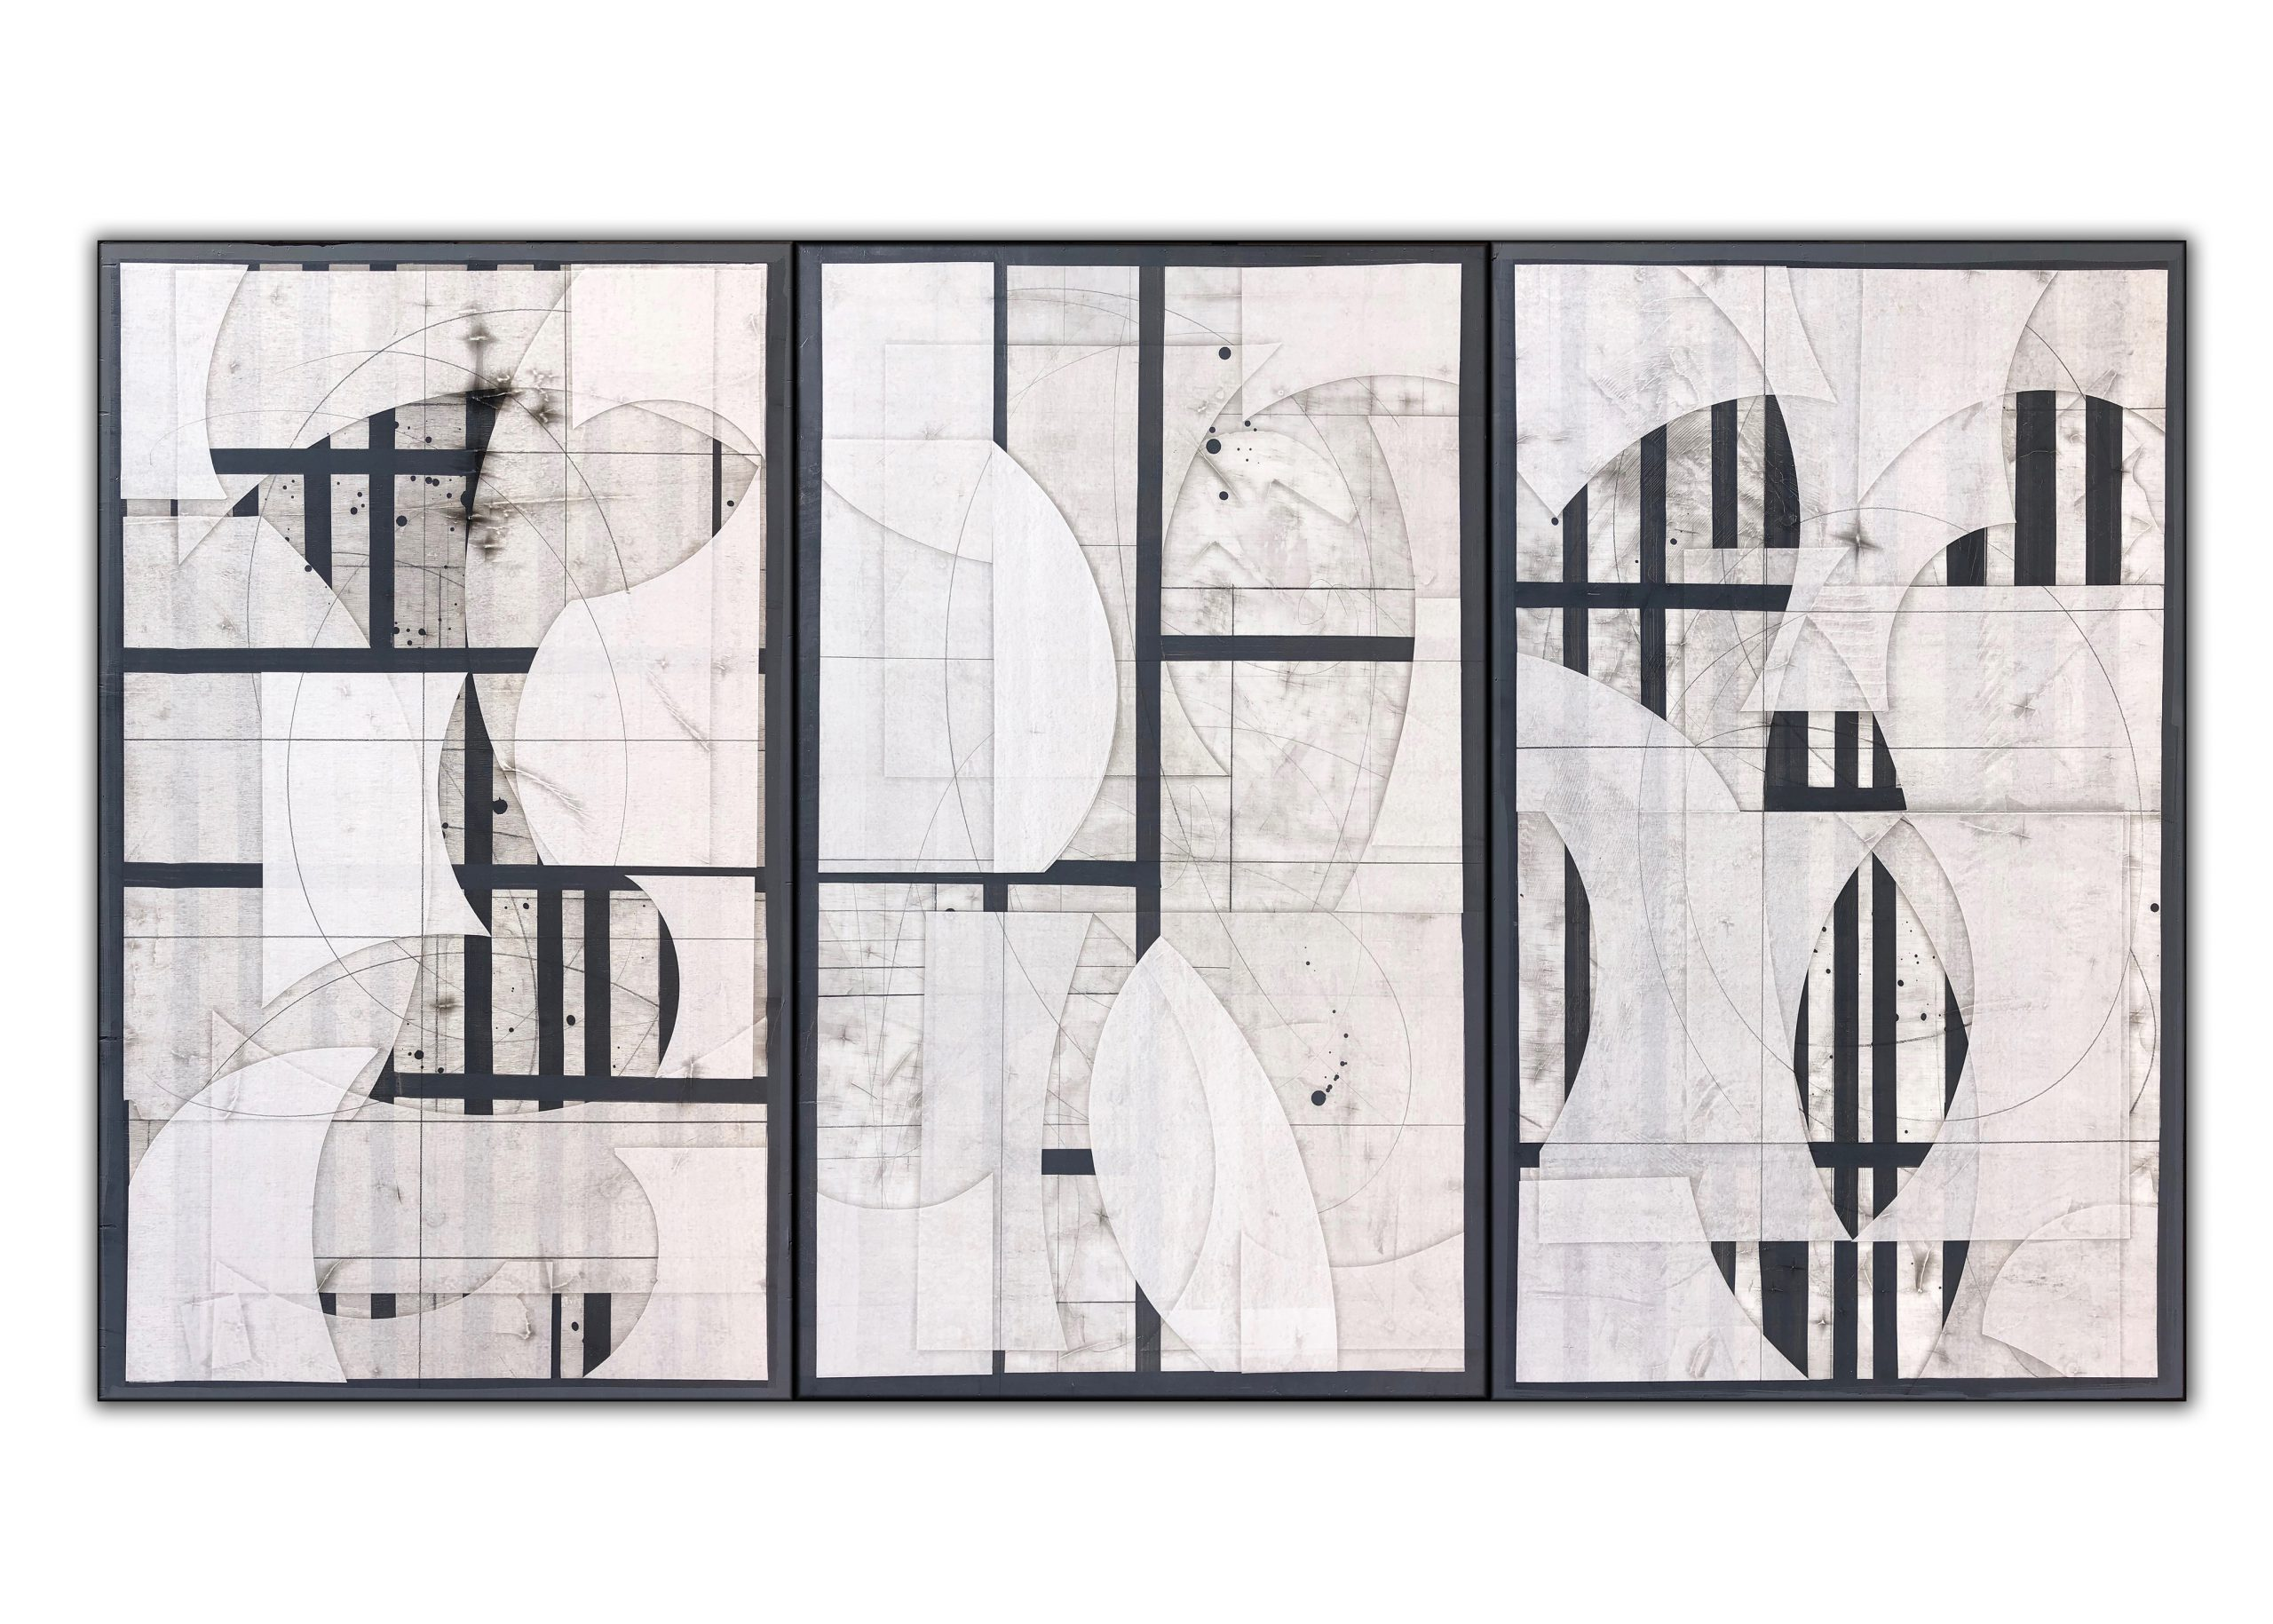 Michael Kessler - Leafnotch (1-2-3)